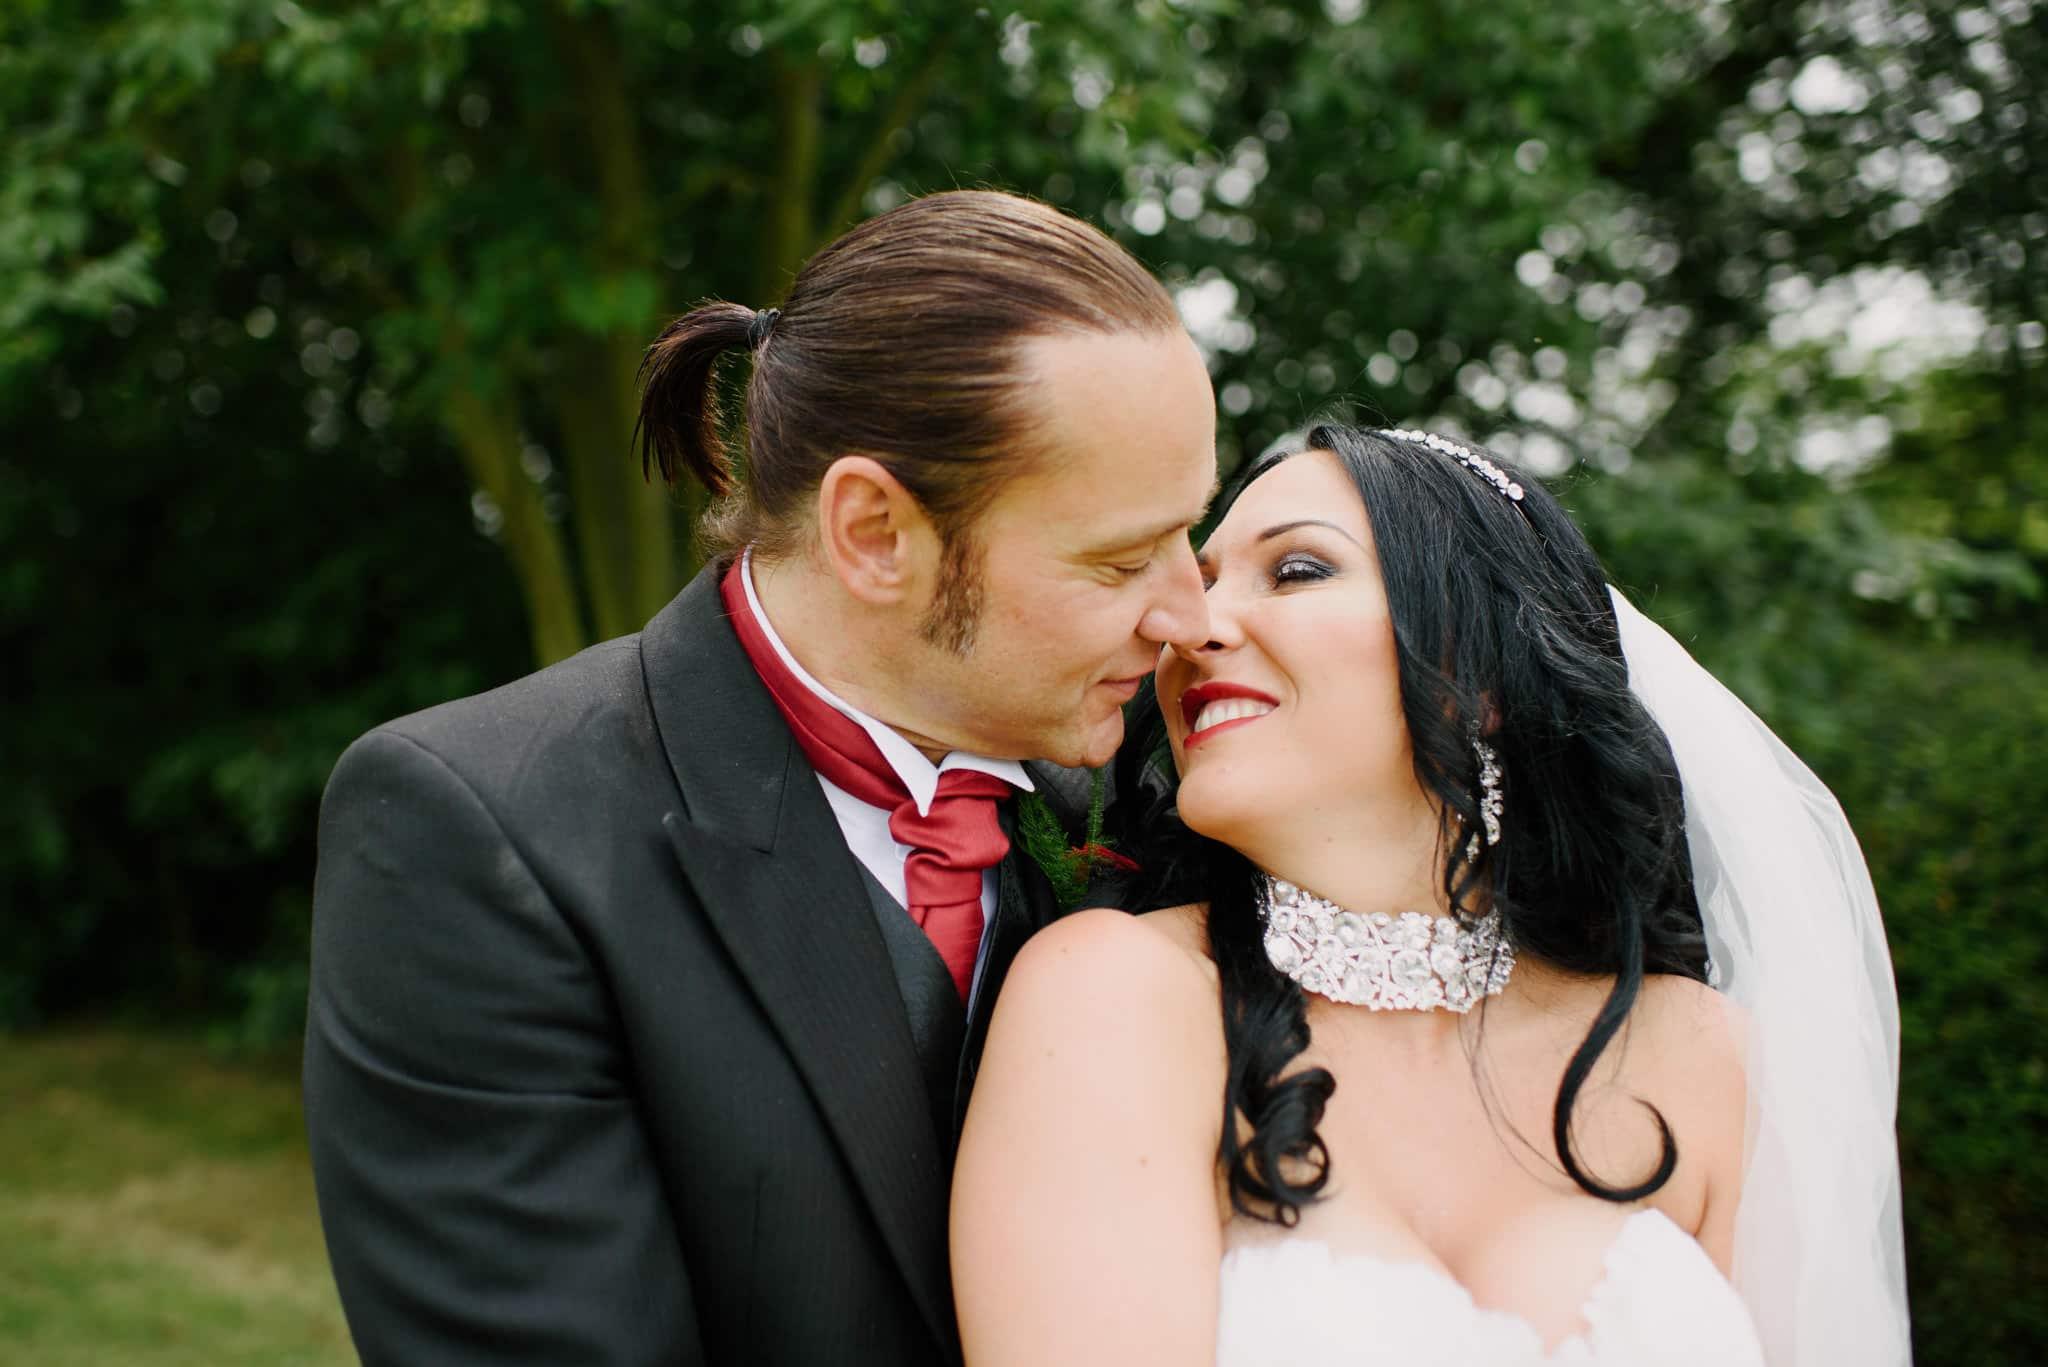 Caroline & Gus - Second Shooting an Essex Wedding 9